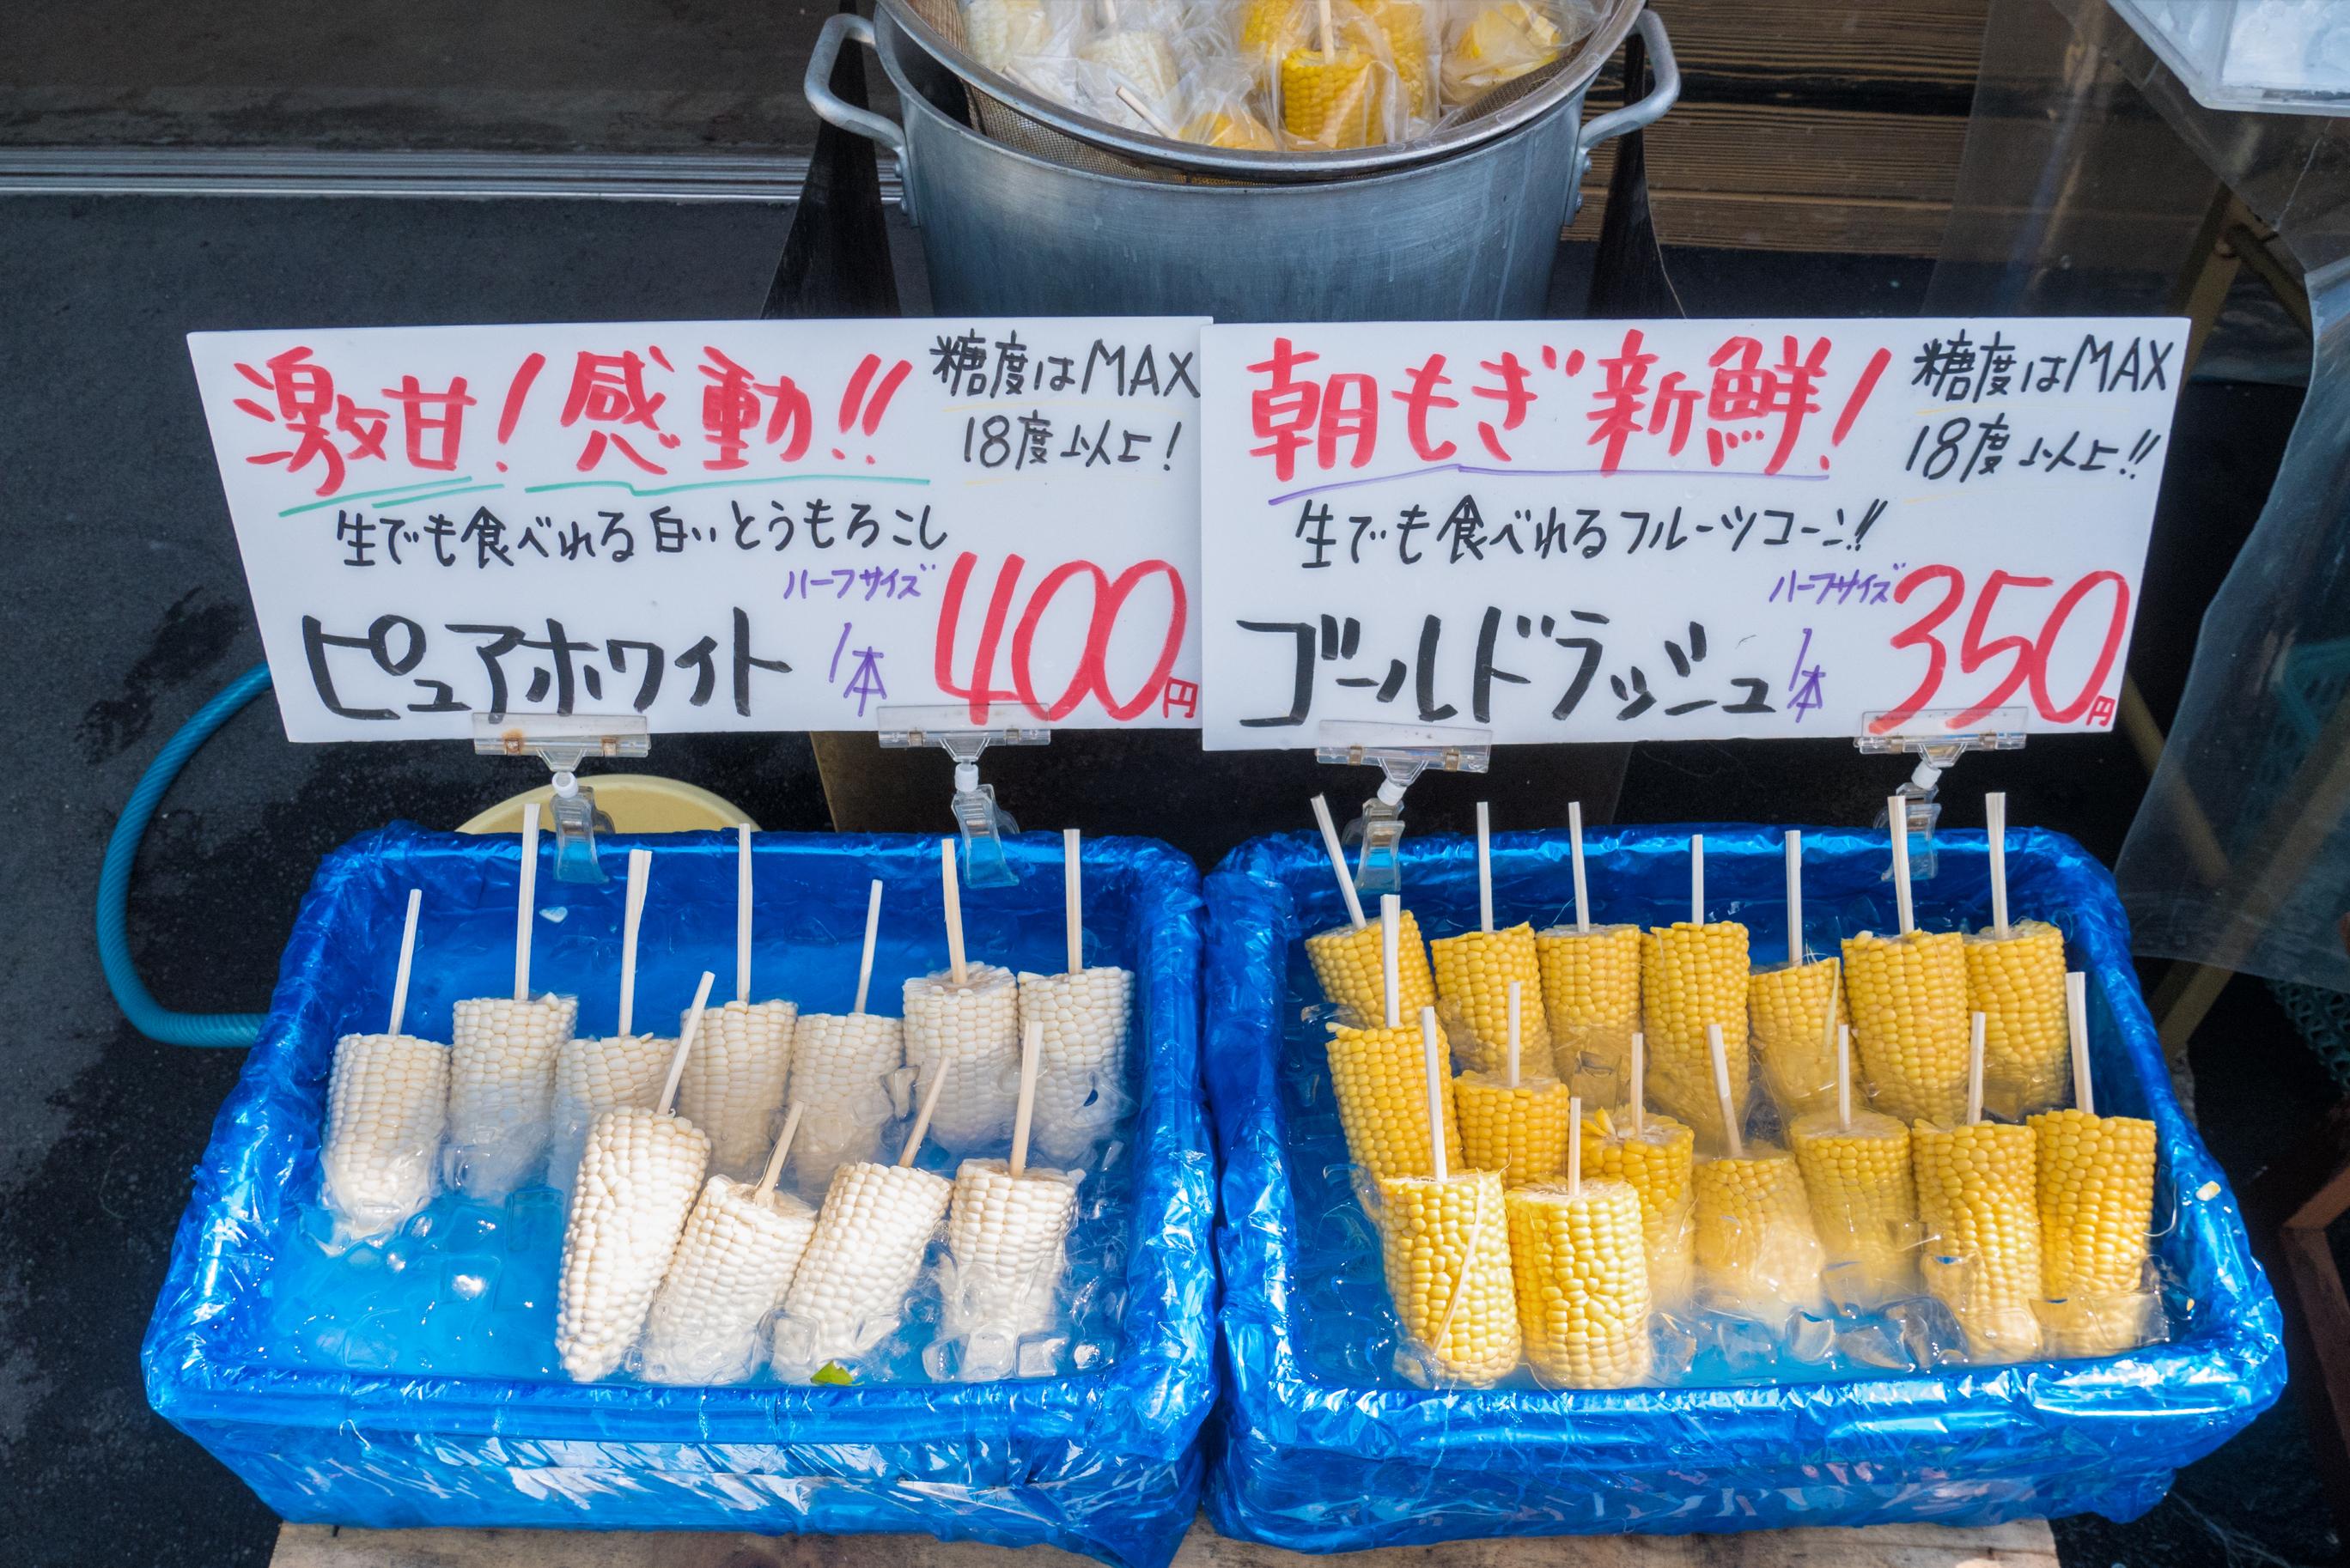 Hokkaido corn